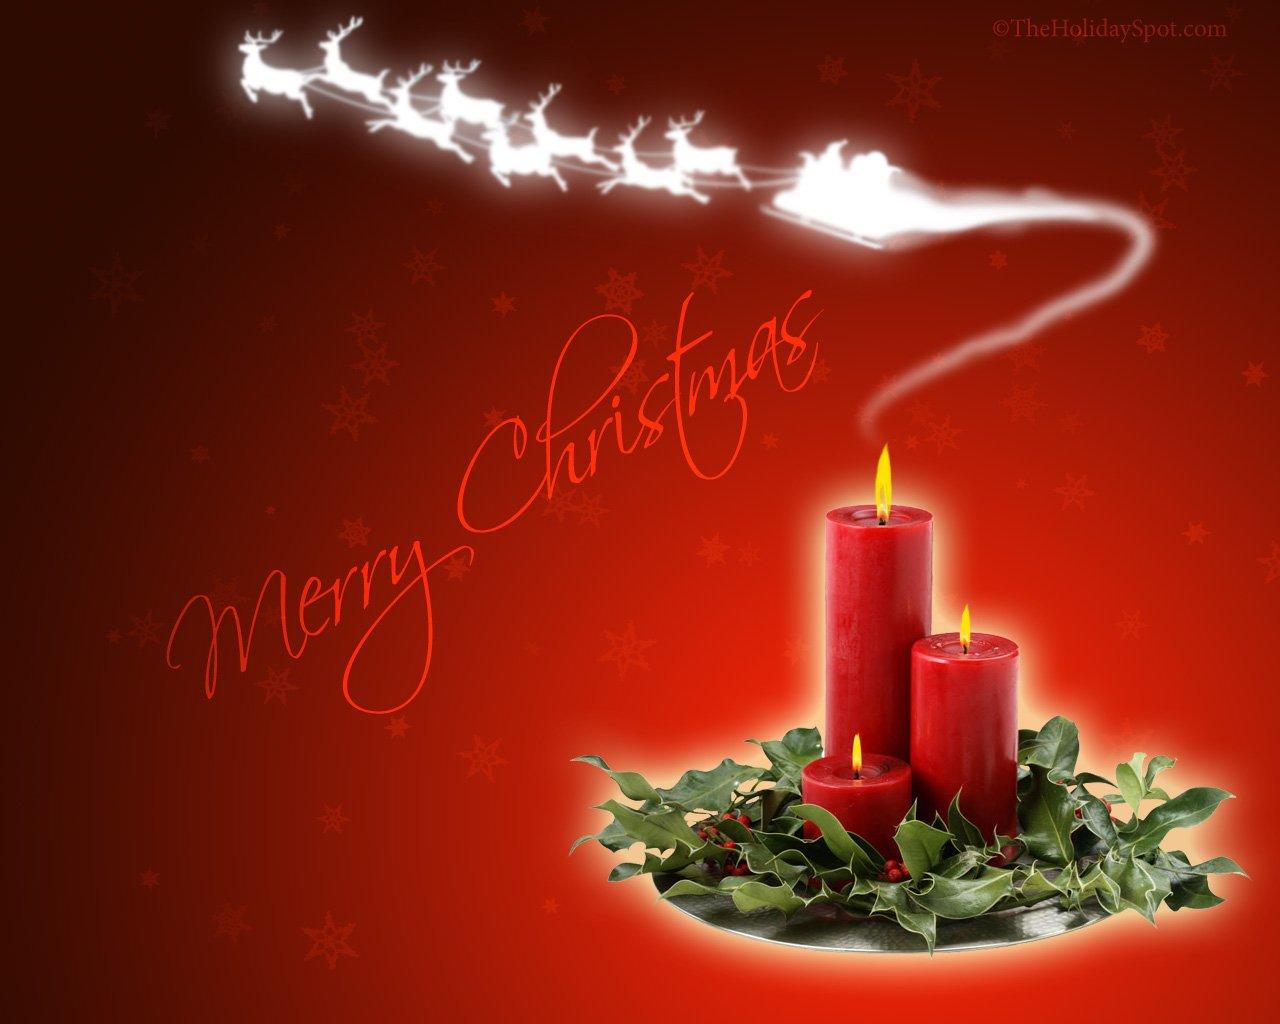 ... Christmas Wallpapers - High quality Merry Christmas wallpaper